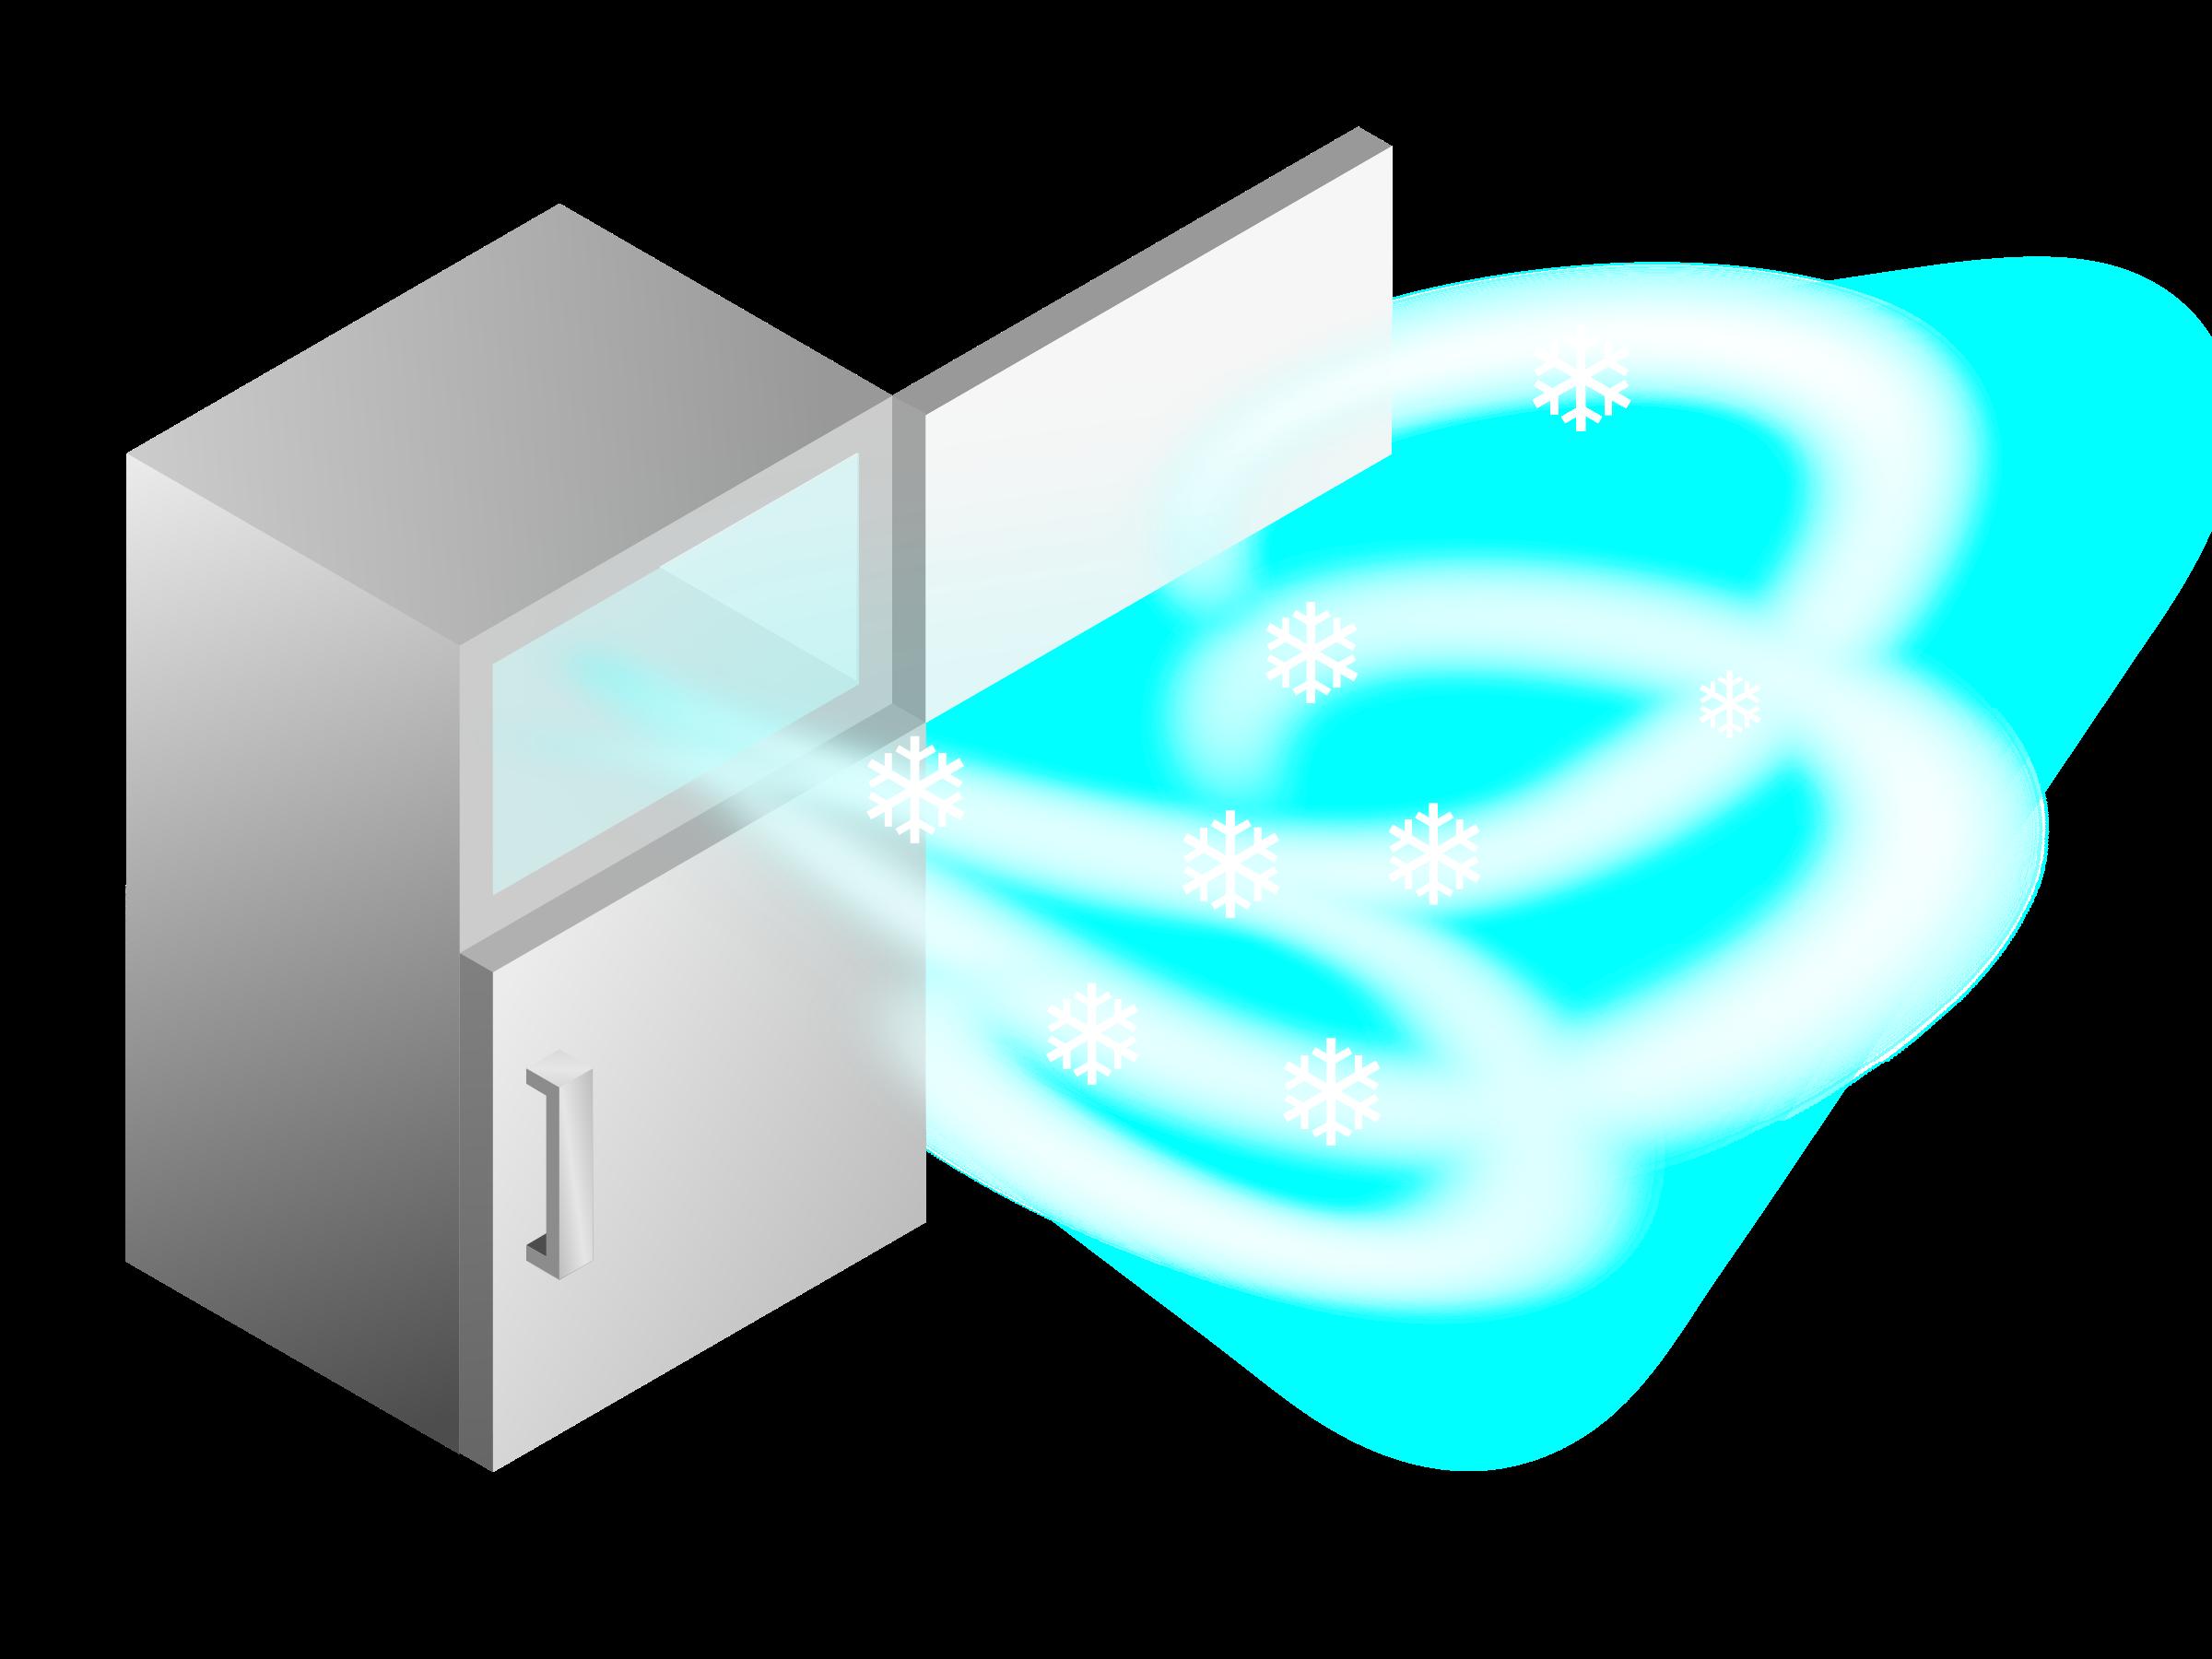 Big image png. Refrigerator clipart ice box